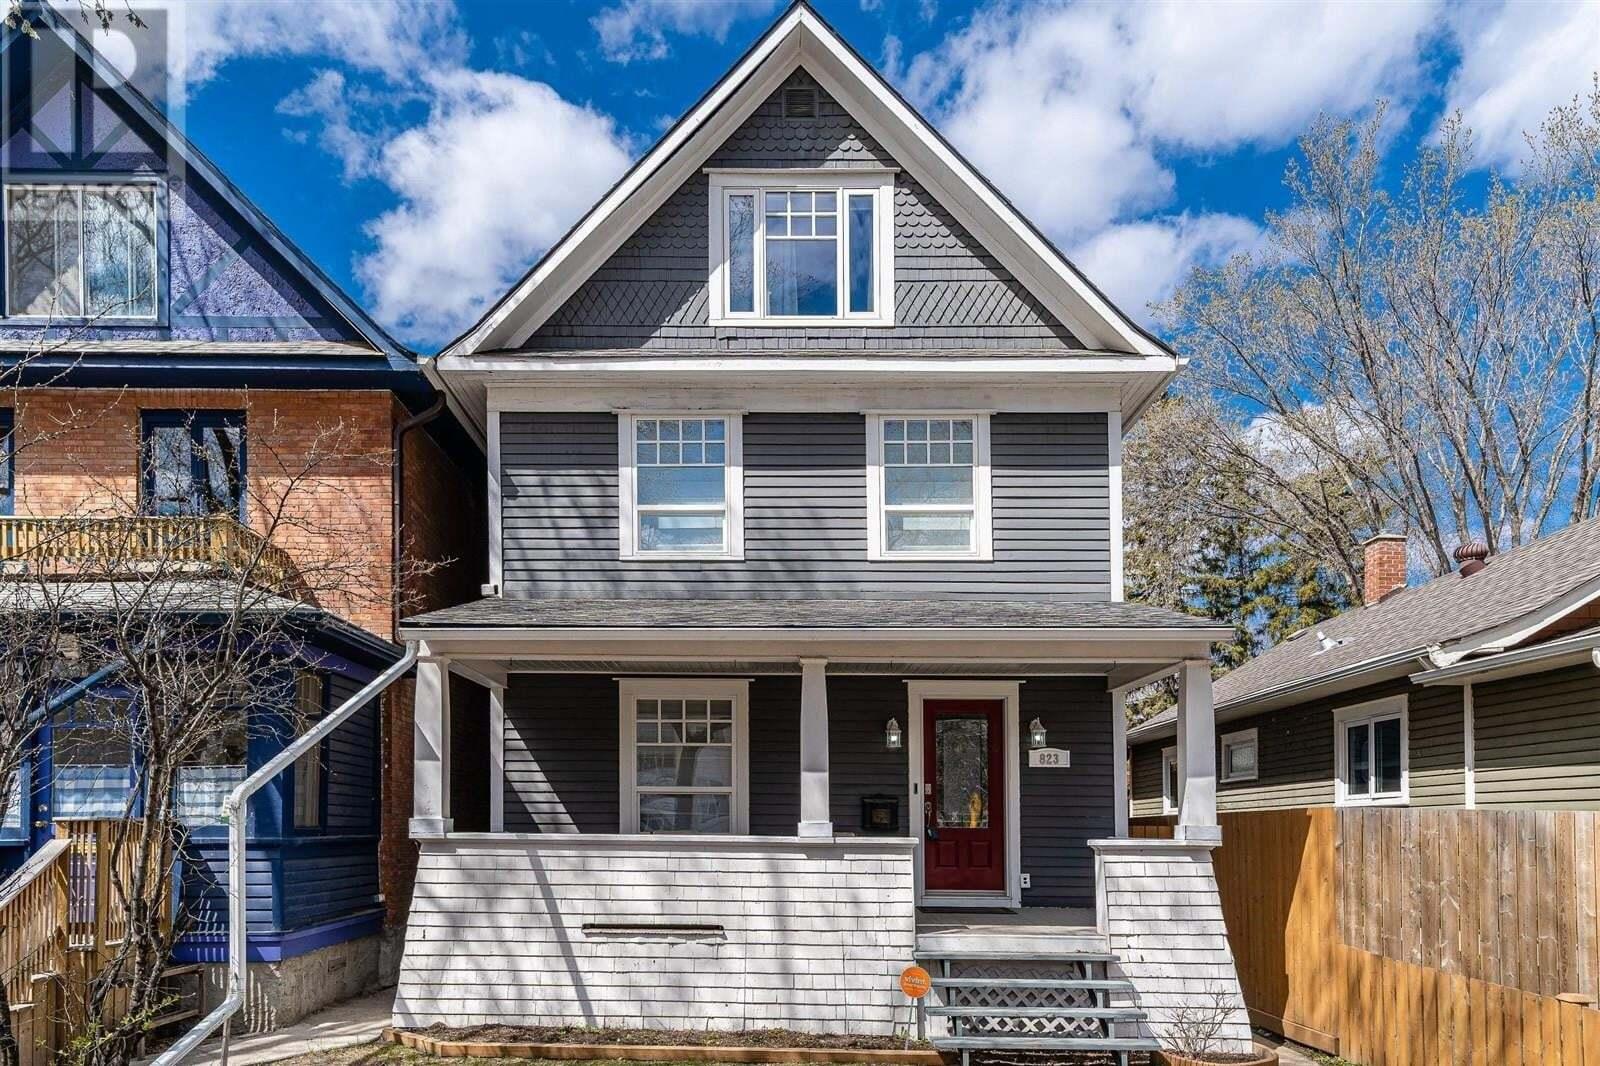 House for sale at 823 7th Ave N Saskatoon Saskatchewan - MLS: SK827845